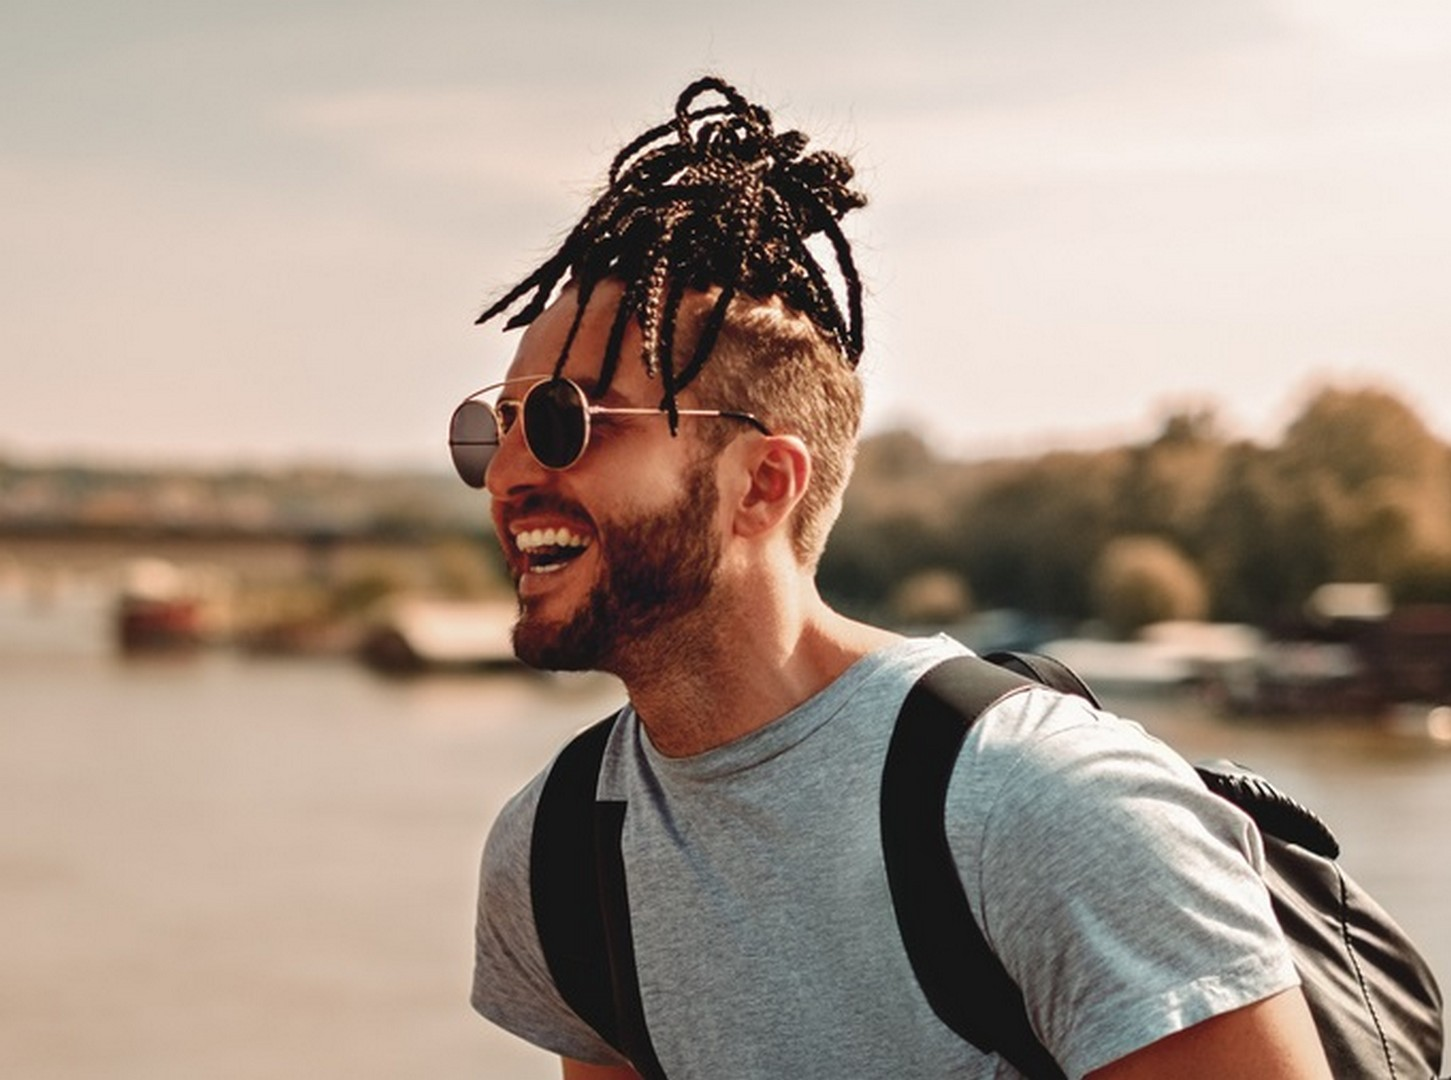 iStock 678025892 - Cortes de cabelo masculino: Dicas de cortes para apostar sem medo